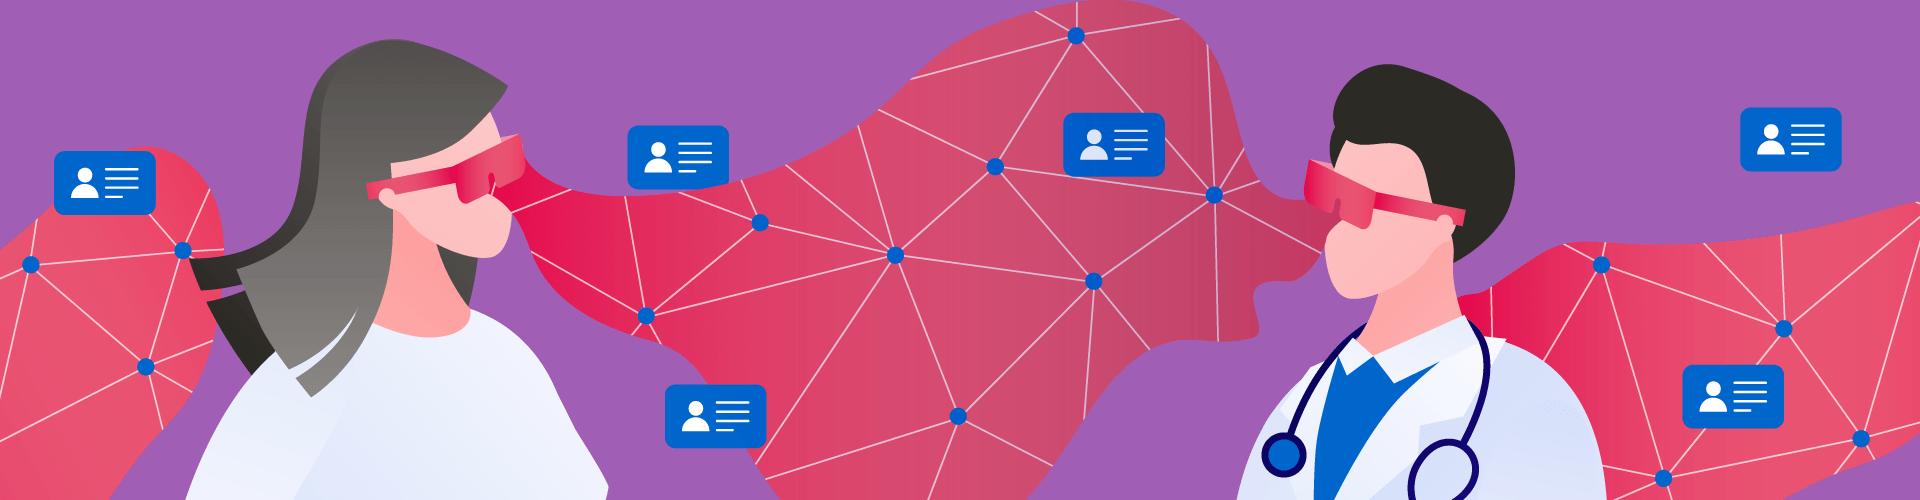 Leveraging big data in healthcare_ebook artilce_header